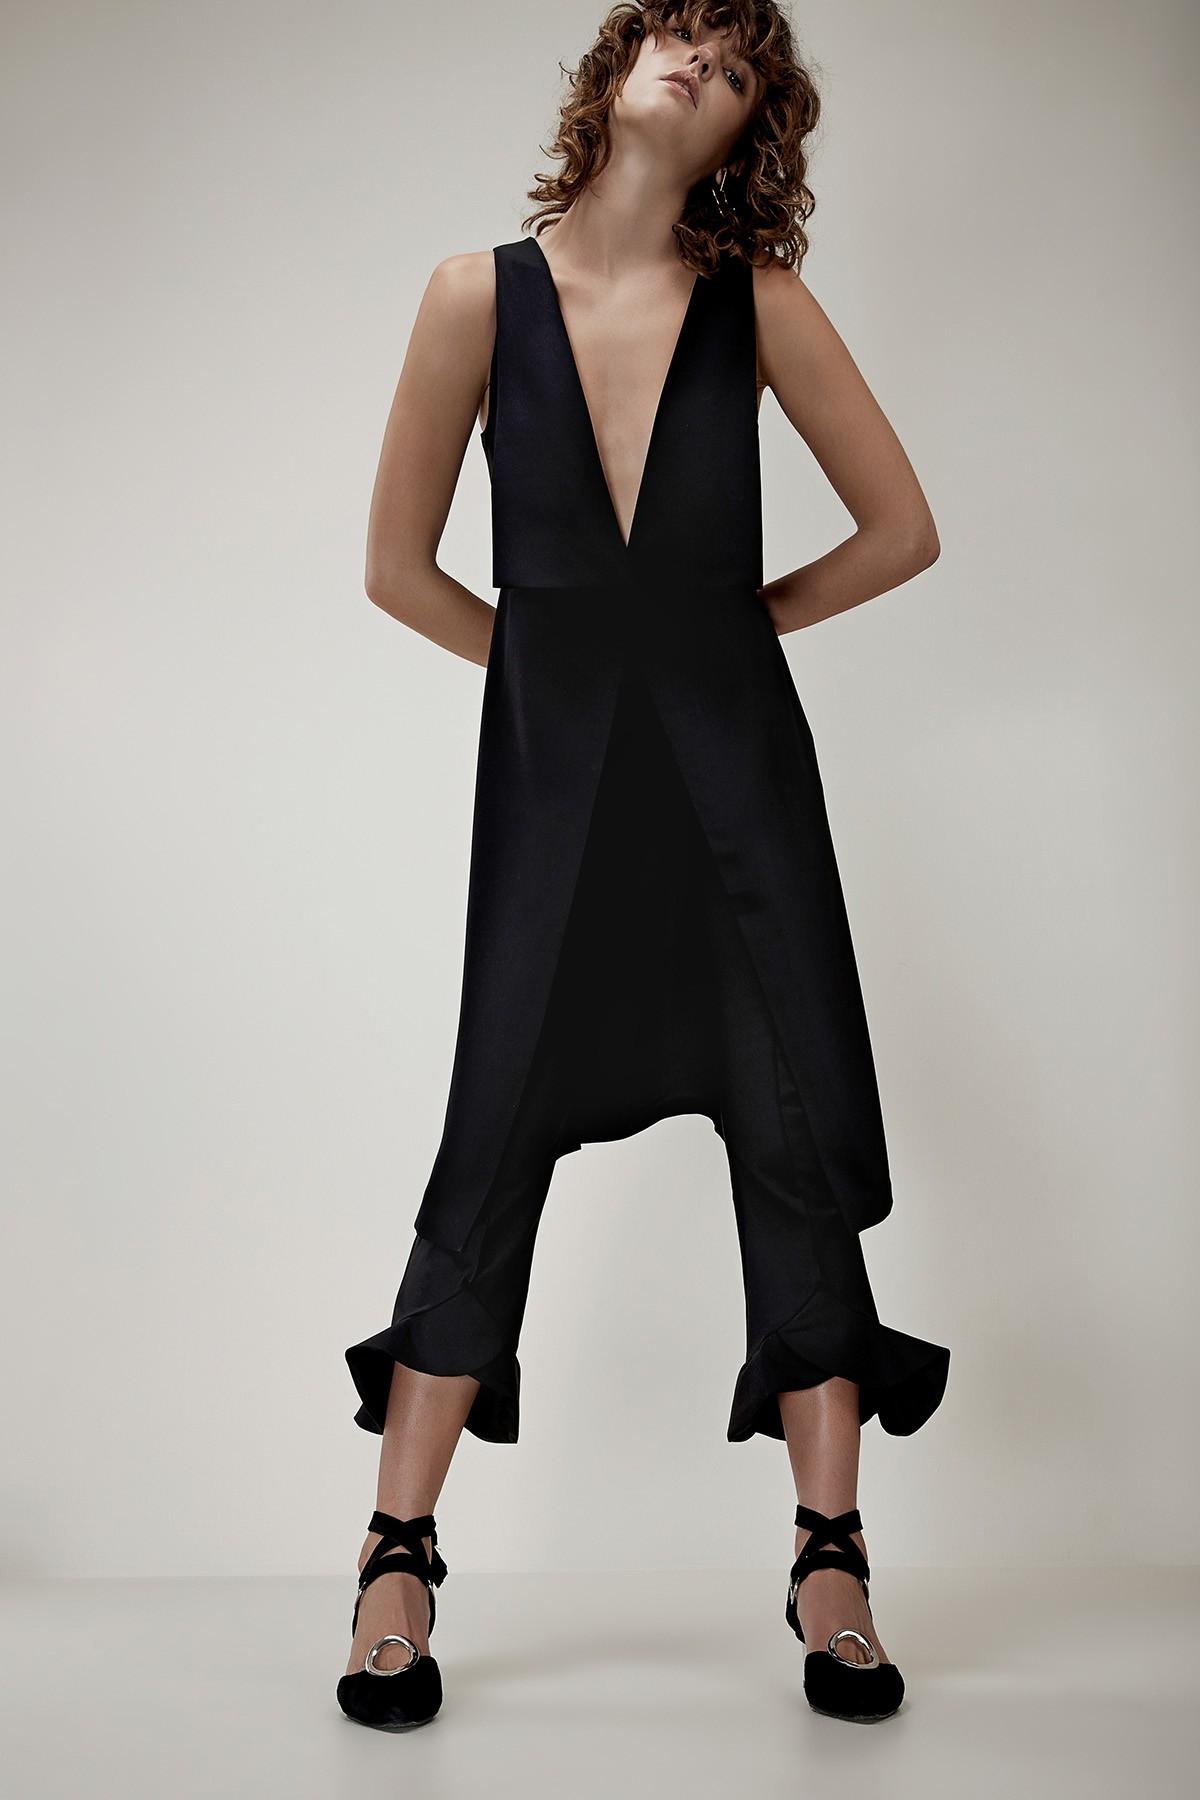 Shop  C/MEO Redefine Vest  +  First Impression Pants .